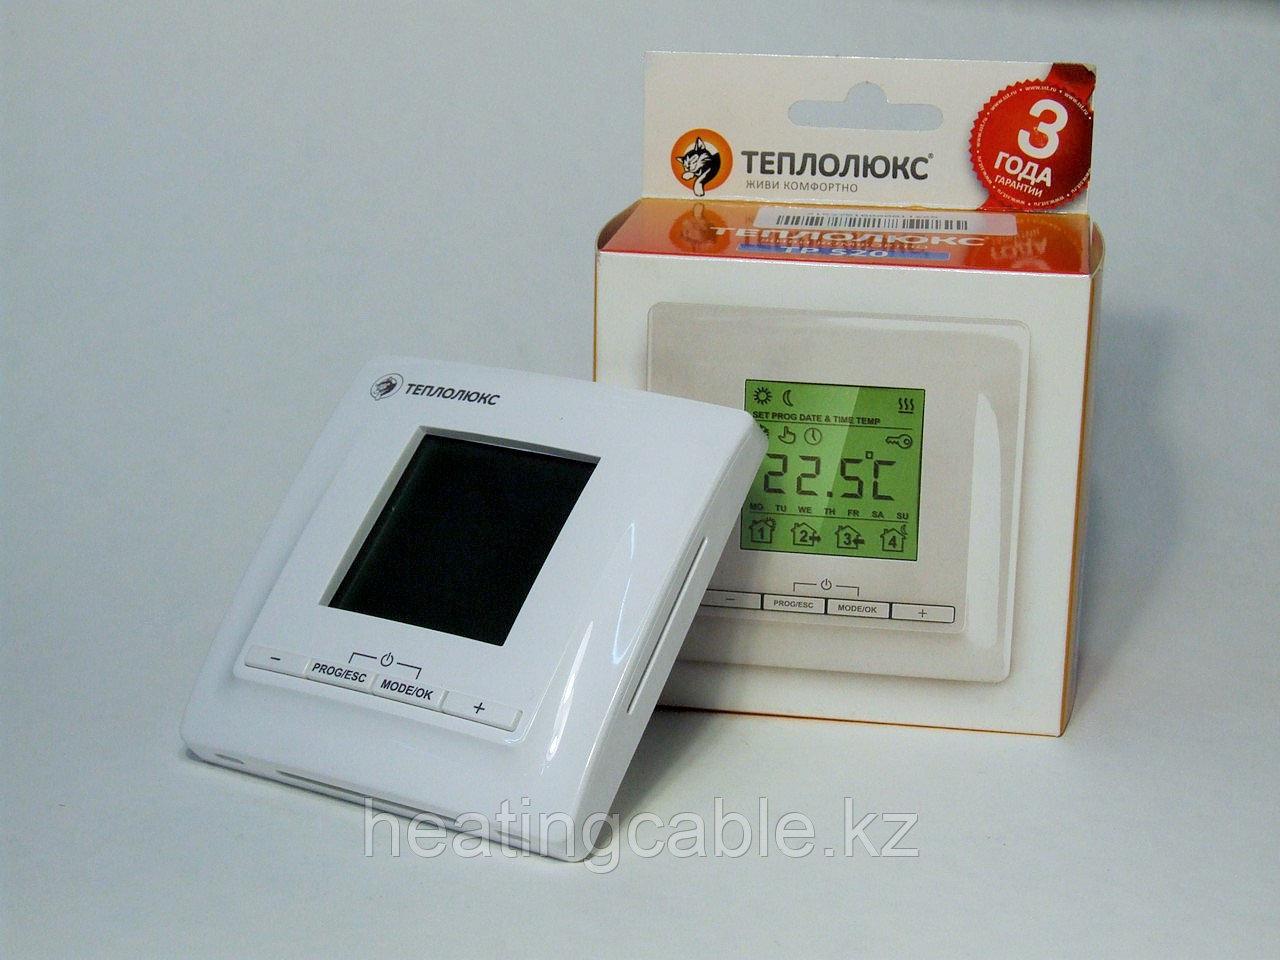 Терморегулятор ТЕПЛОЛЮКС-520